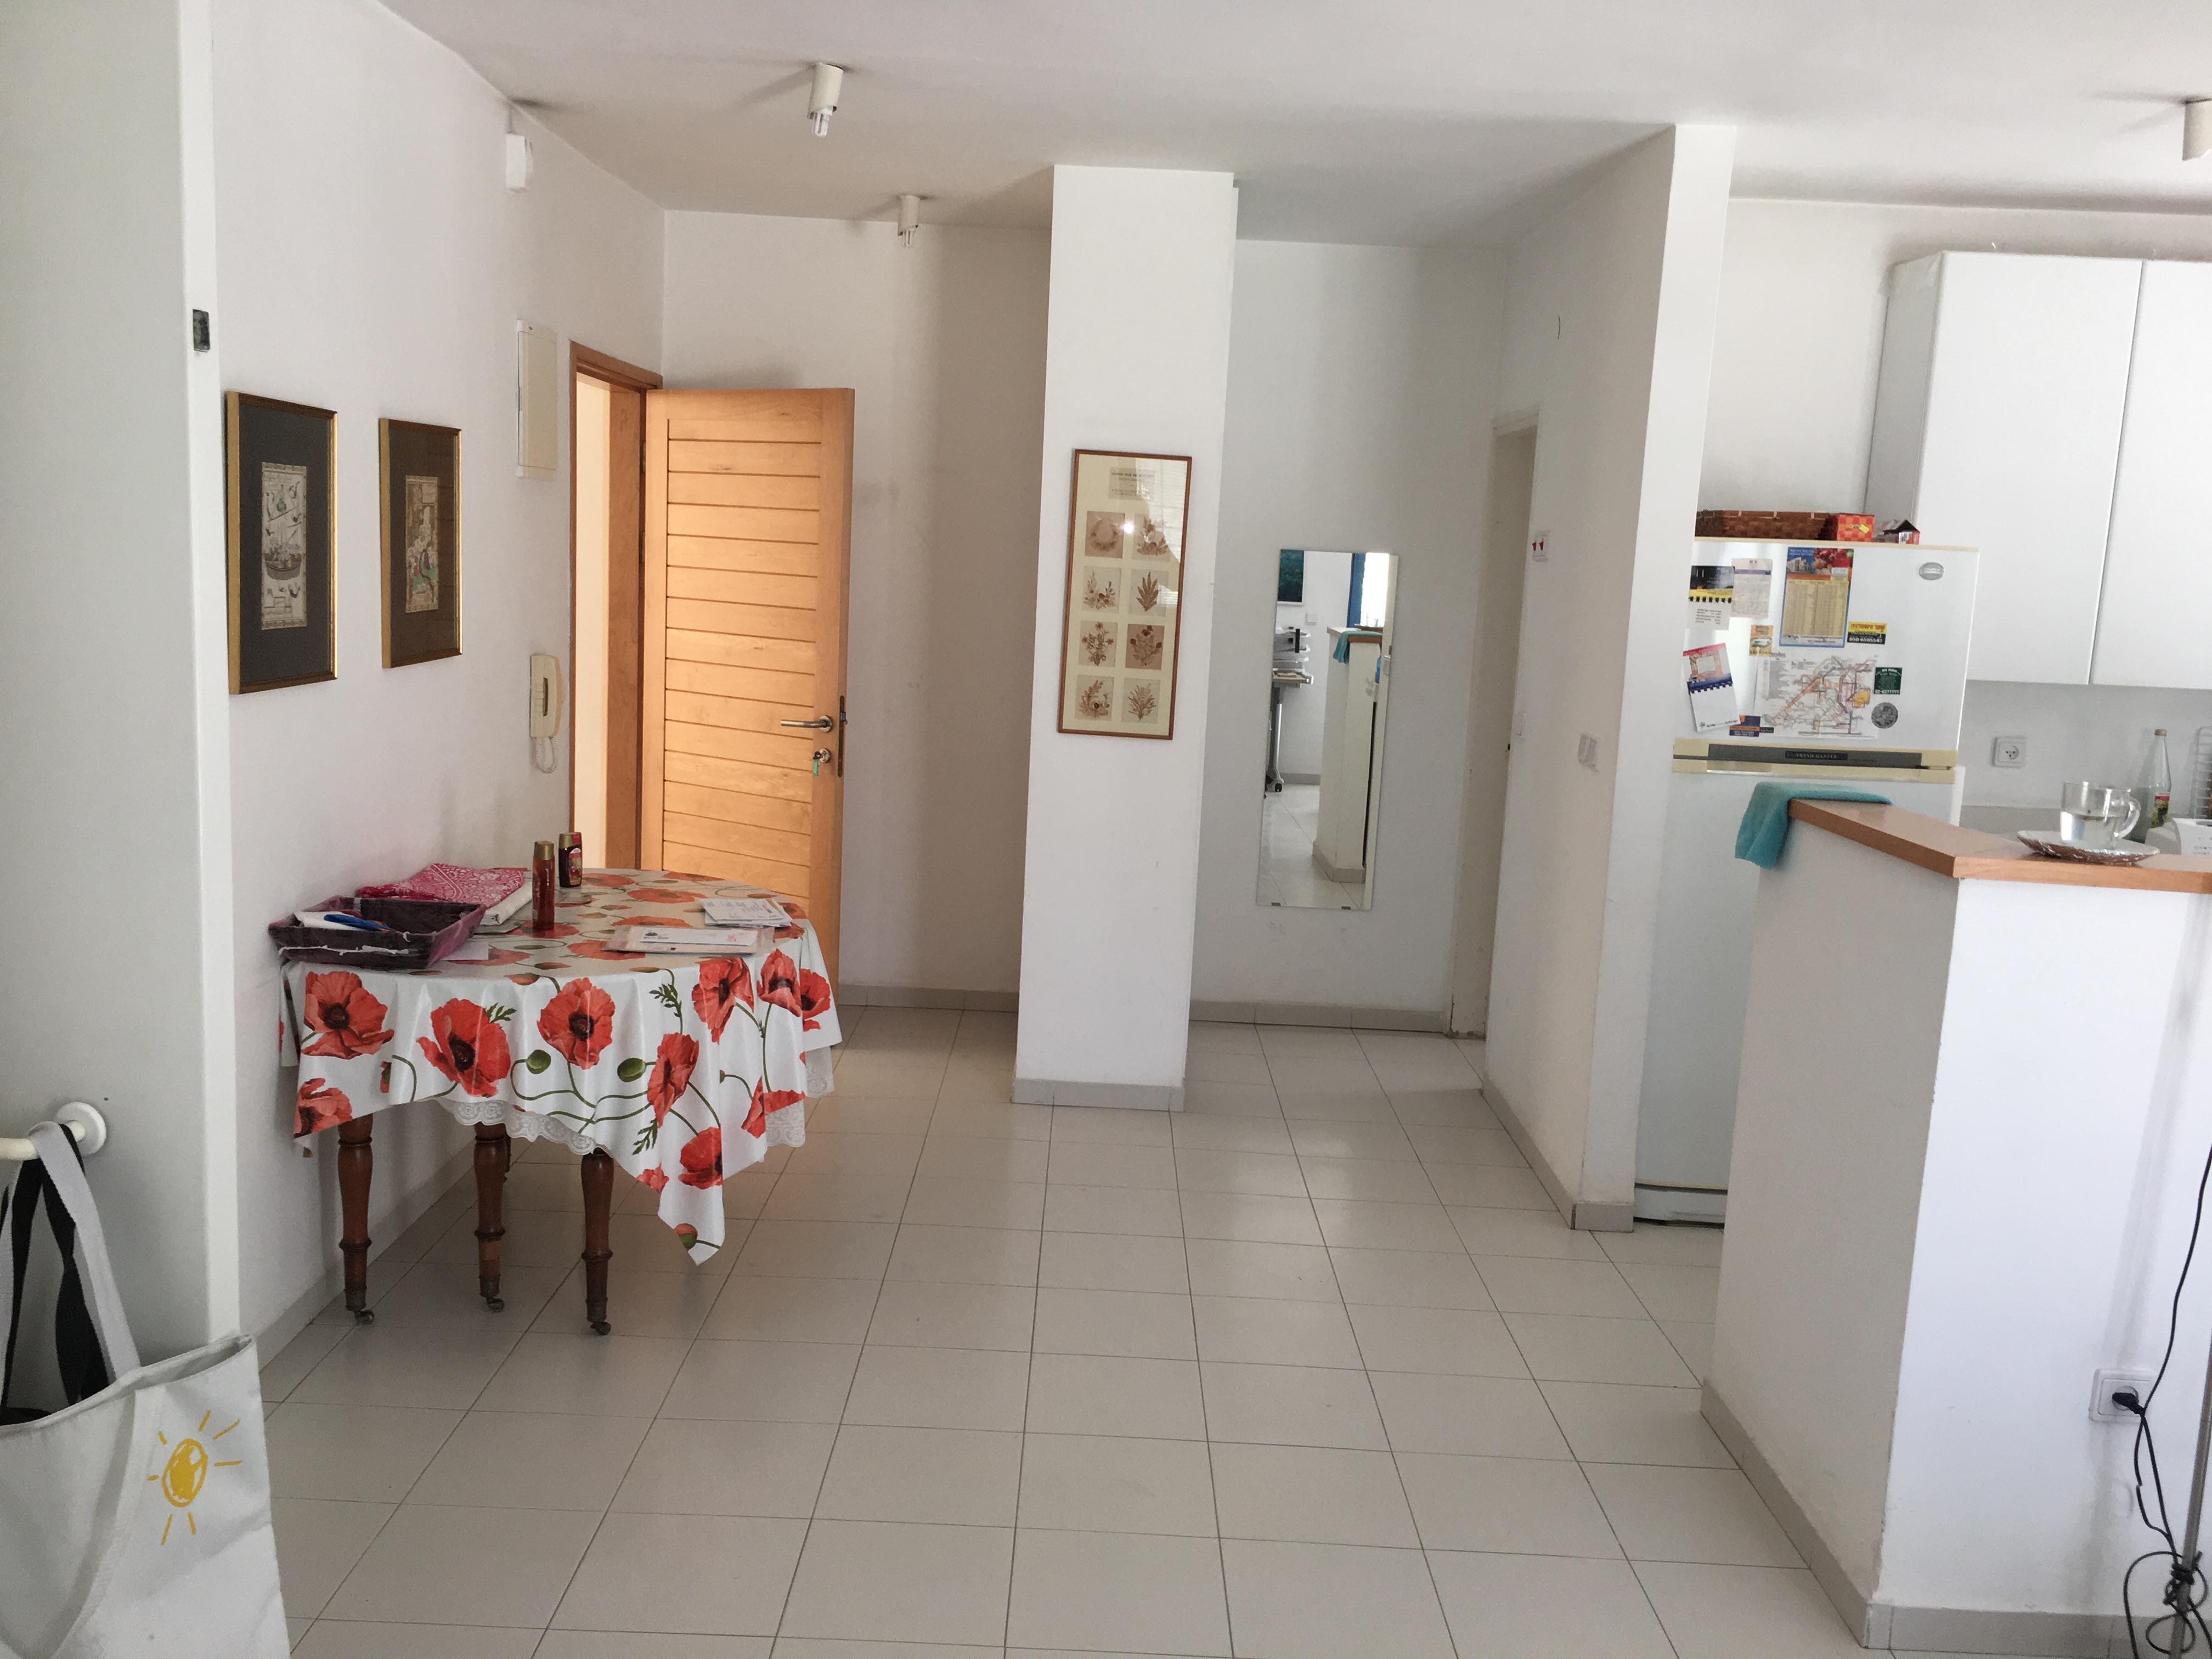 2 rooms for rent in Old Katamon – Aba Hilkiyah street